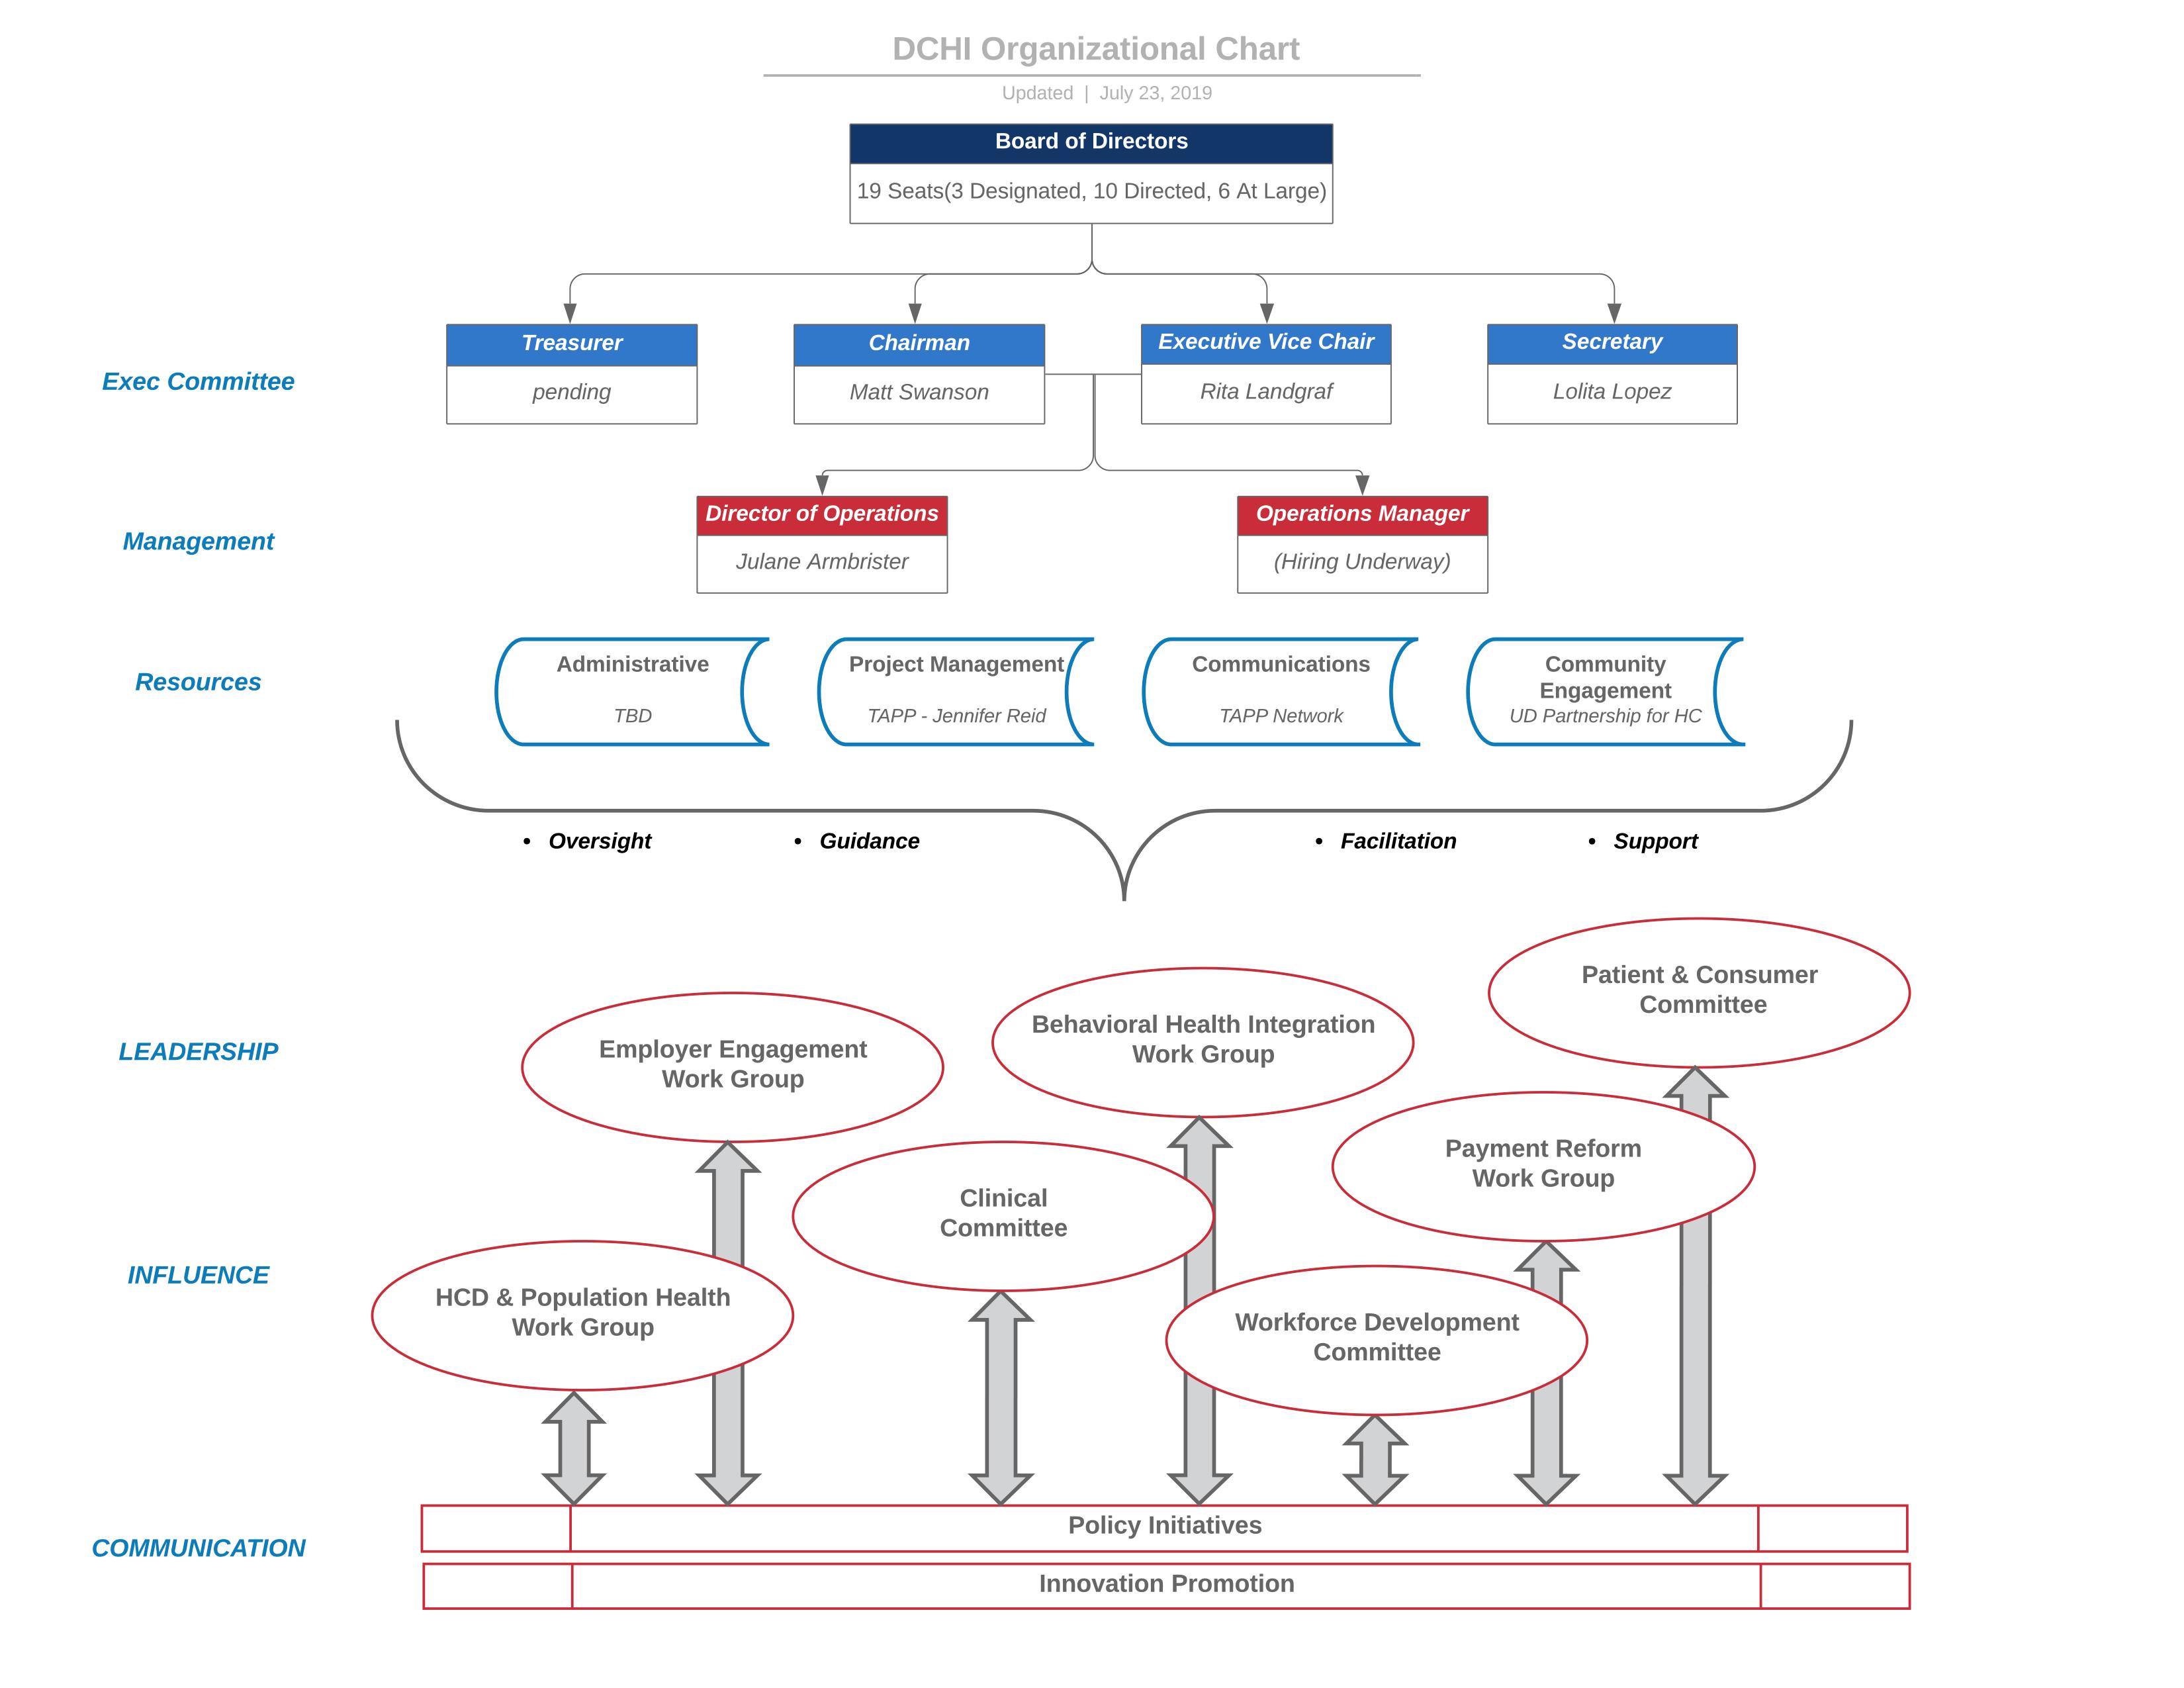 DCHI Organizational Overview 7.23.19 (2)